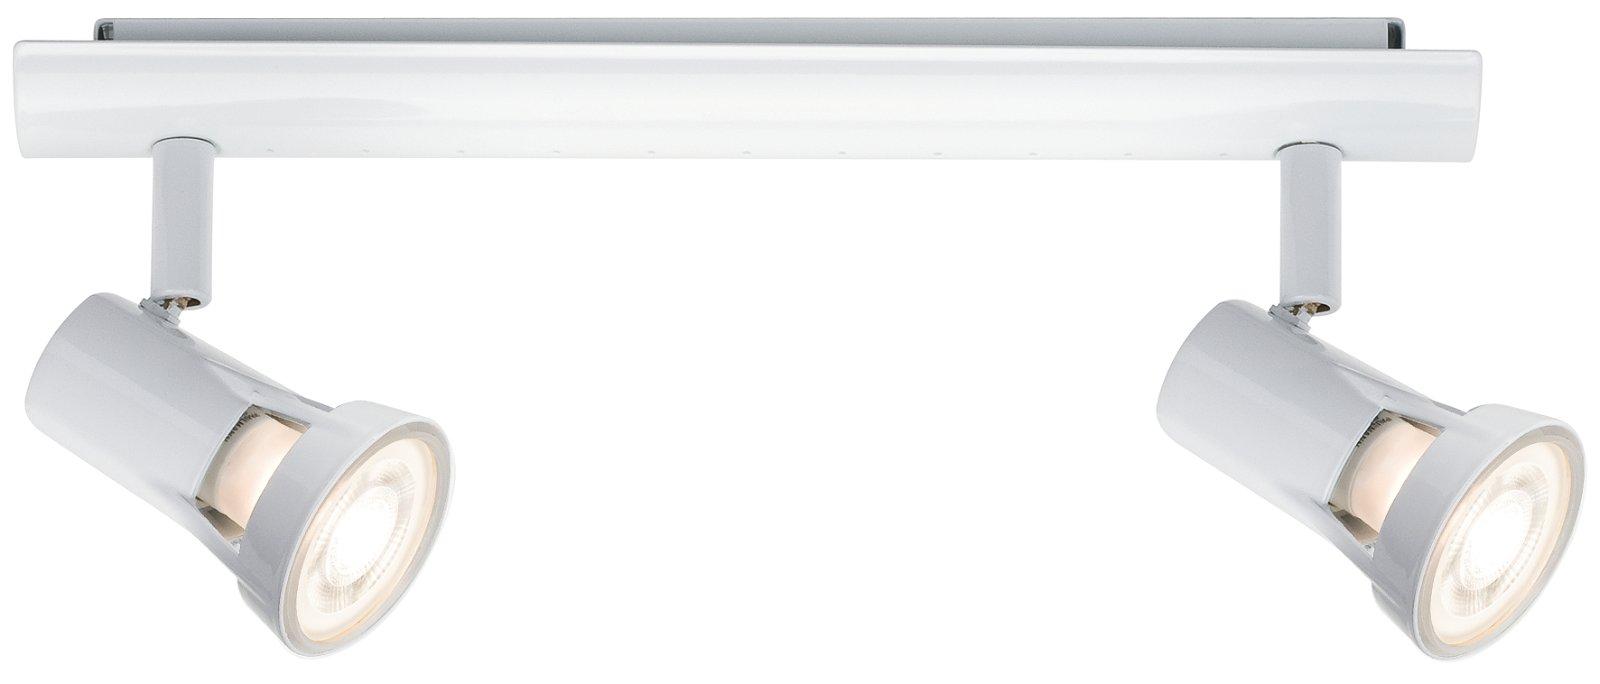 Deckenstrahler Teja GU10 230V max. 2x10W Weiß